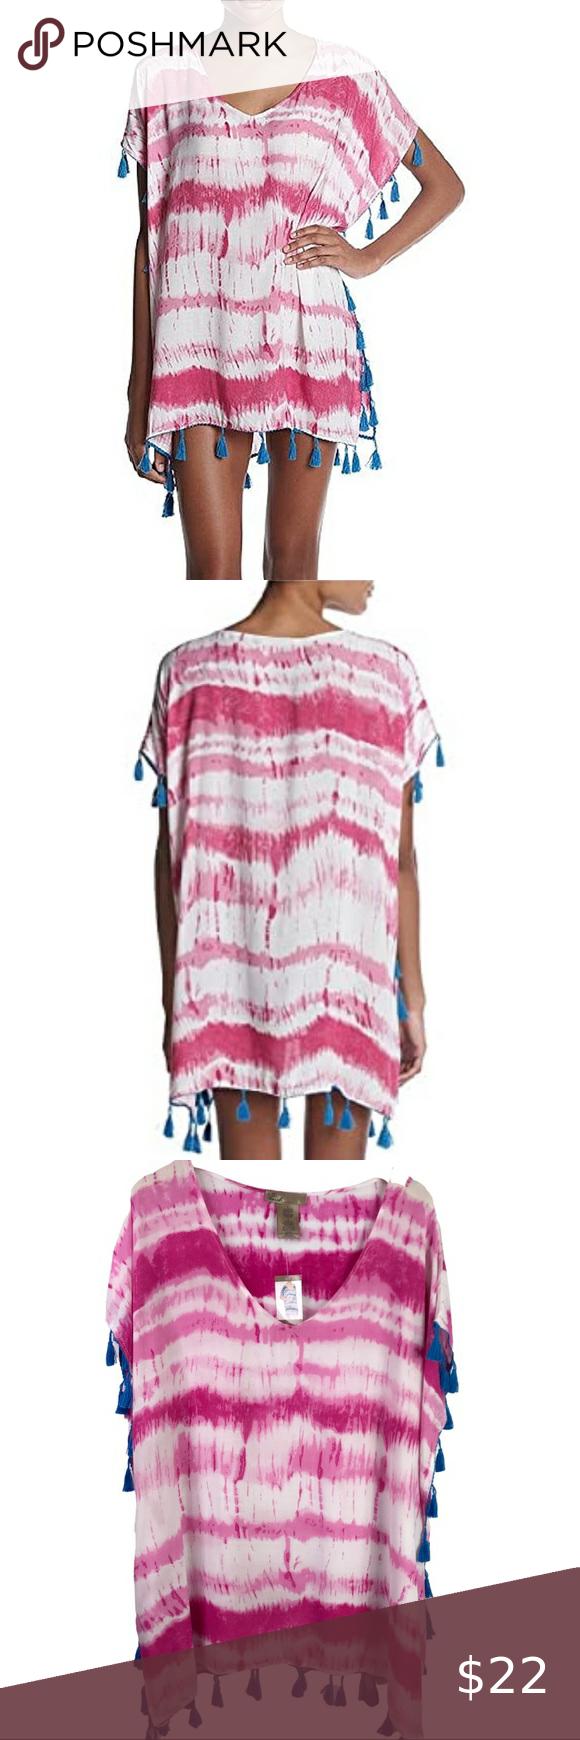 NWT Women/'s C/&T Pink Blue Tassel Swim Beach Cover Up Size XL X-Large